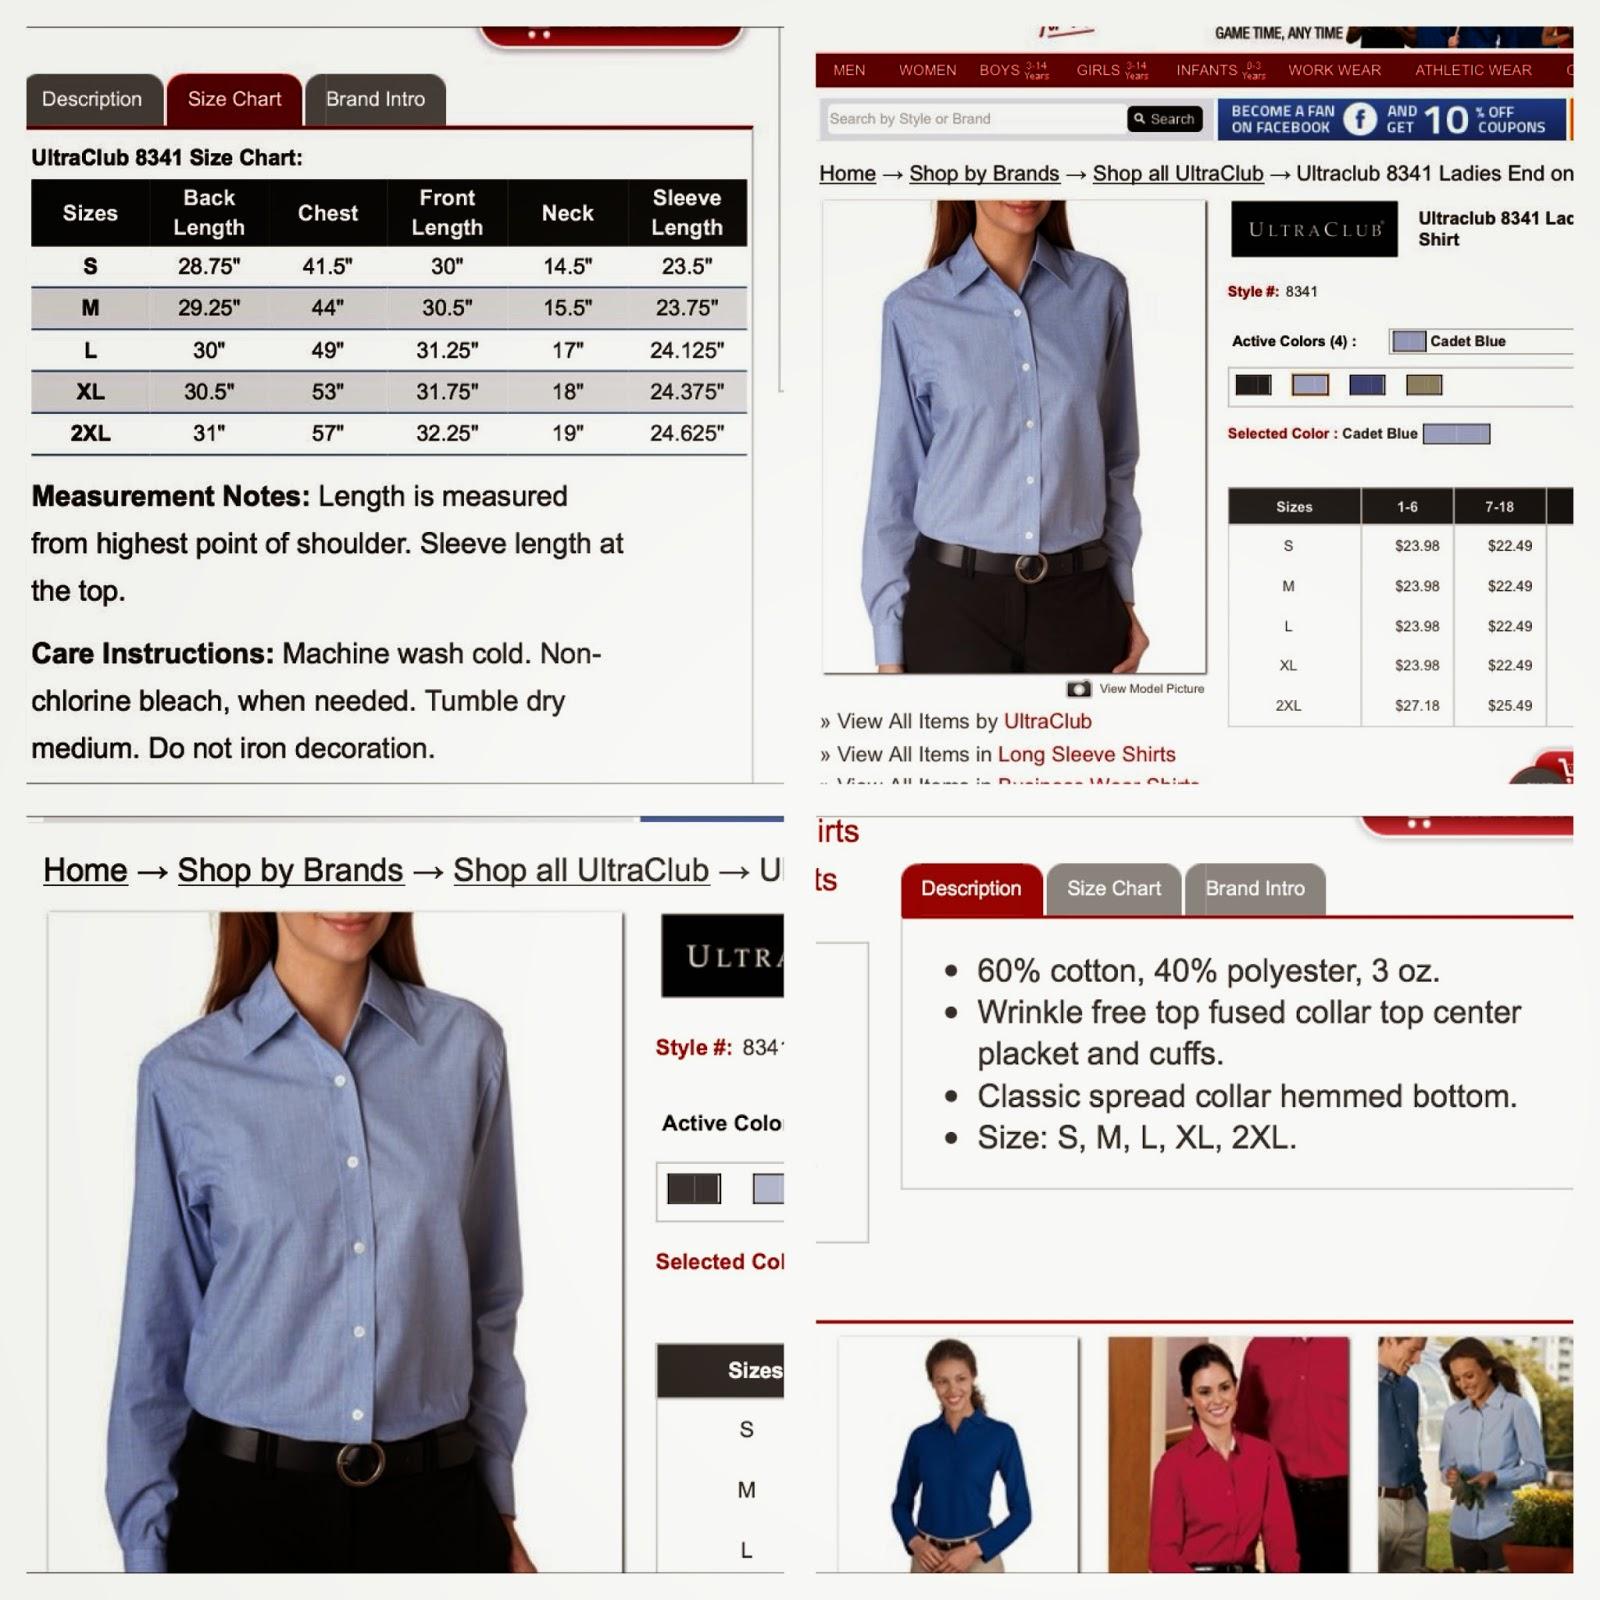 cadet blue dress shirt by ultra club,size chart for women shirts, shirt colors, shirt length,